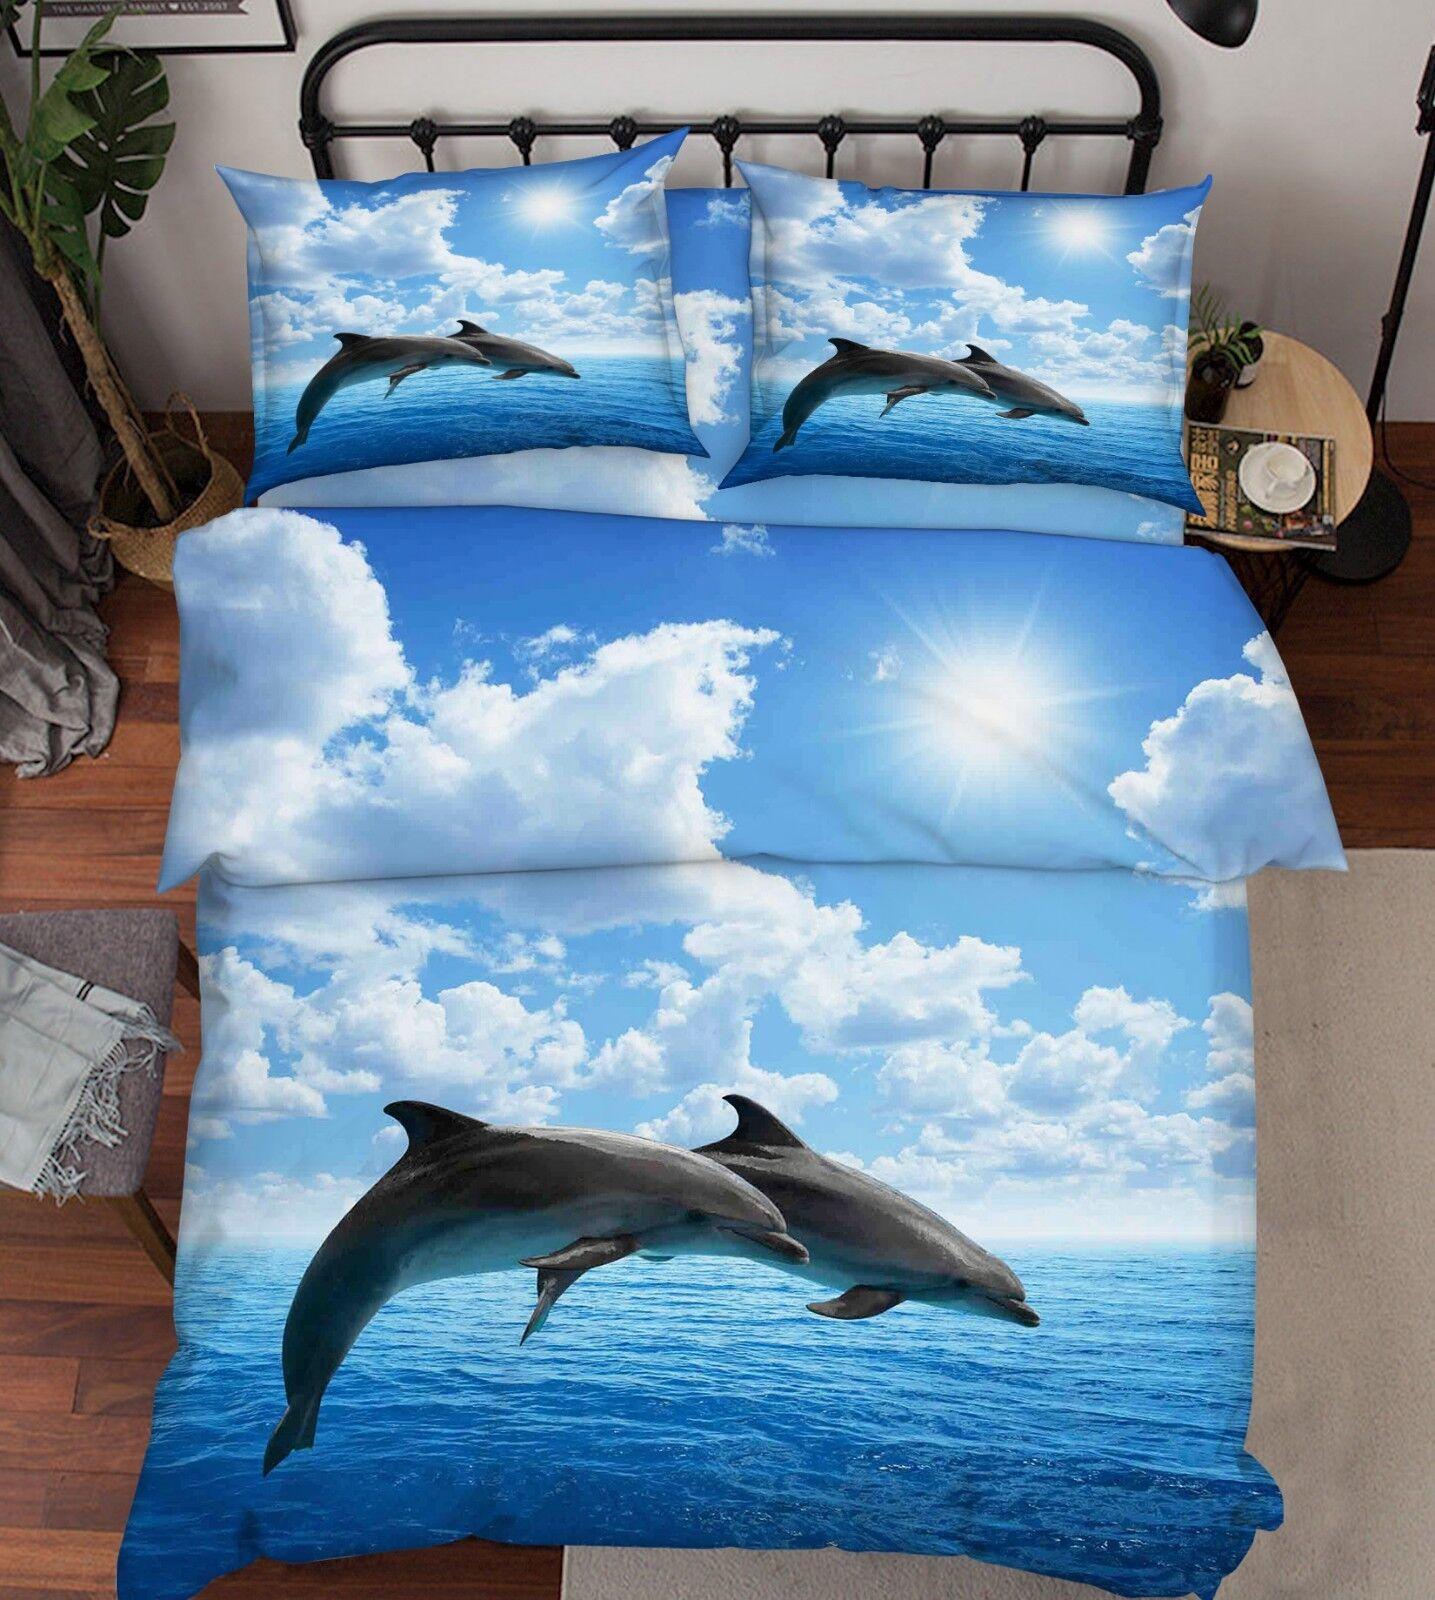 3D Dolphin Ocean Sky 3 Bed Pillowcases Quilt Duvet Cover Set Single Queen King